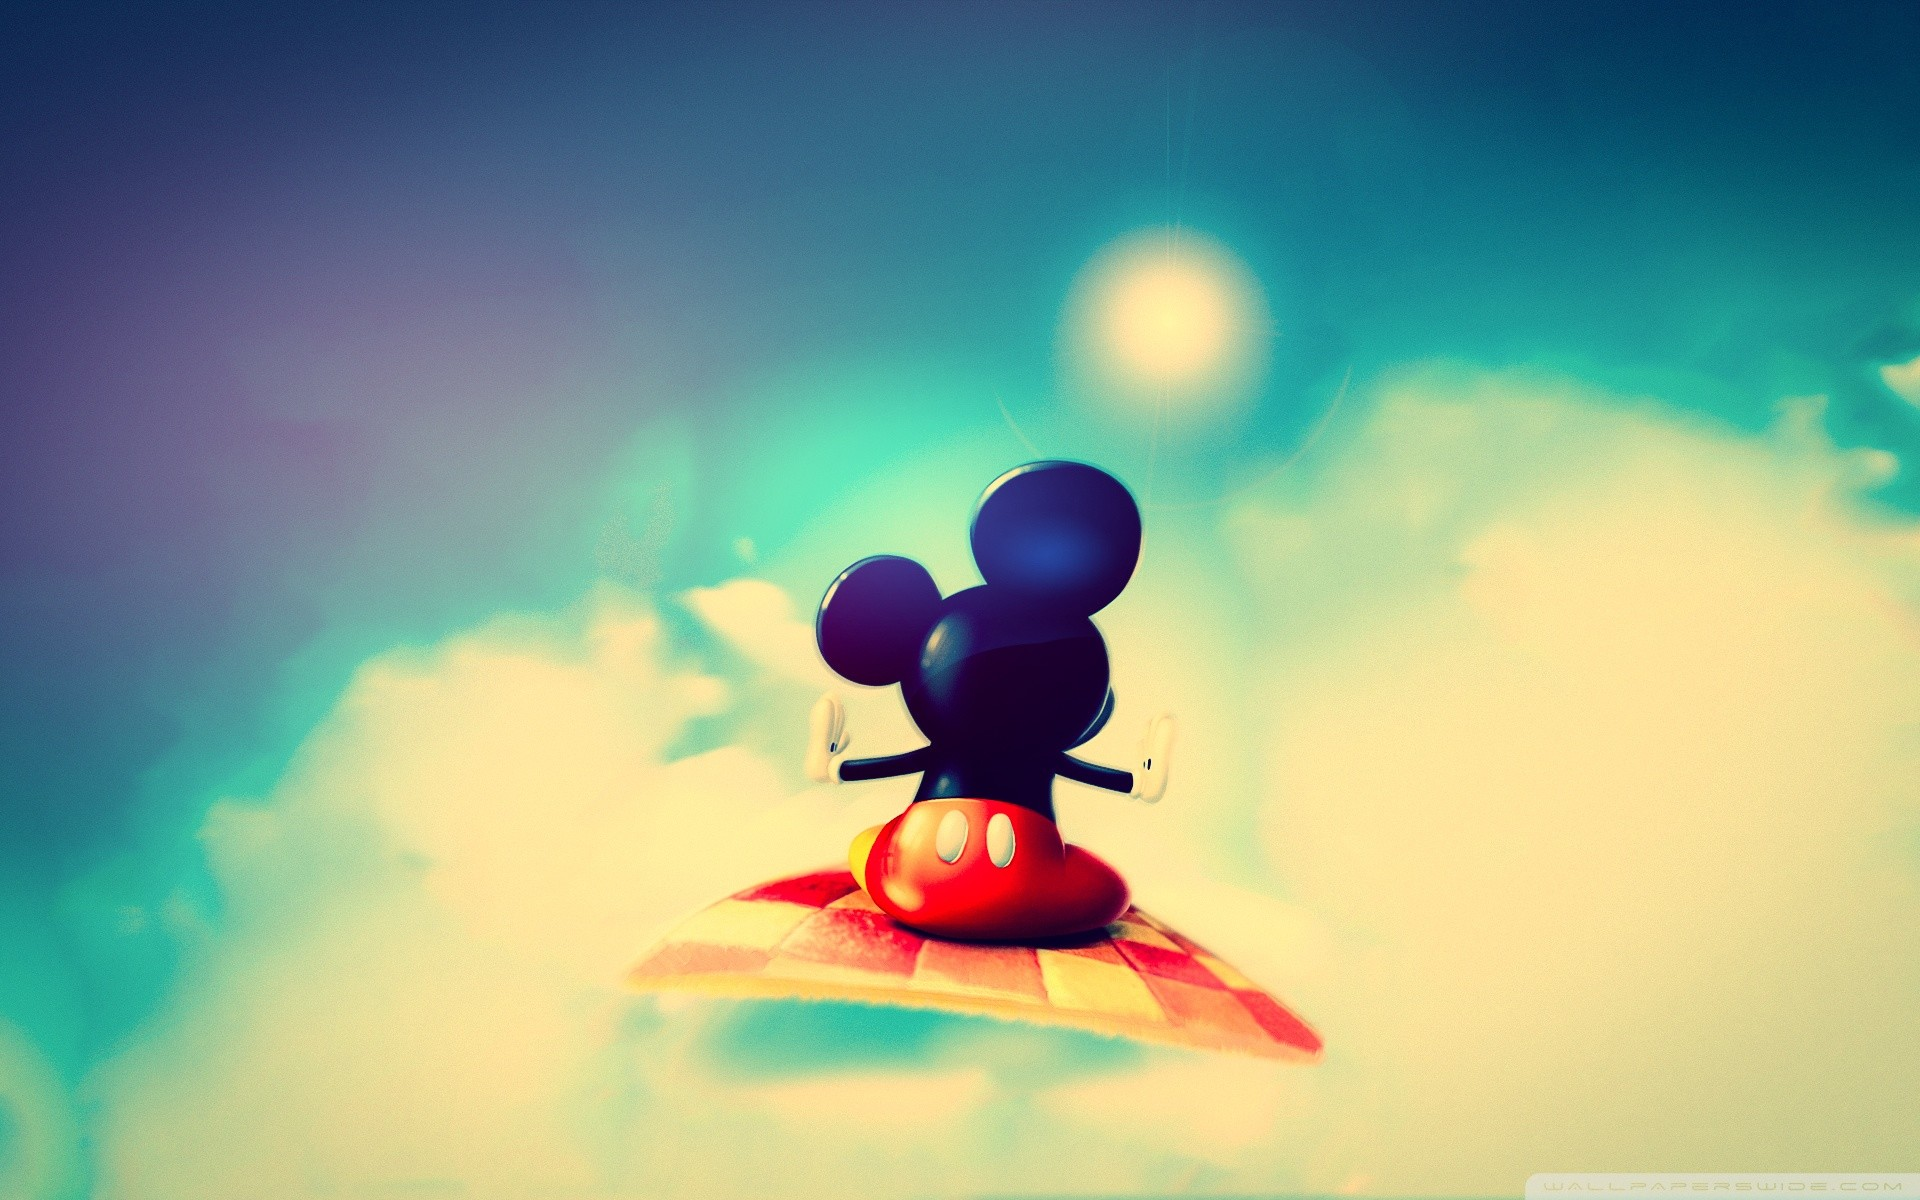 … Old Disney HD Desktop Wallpapers for .